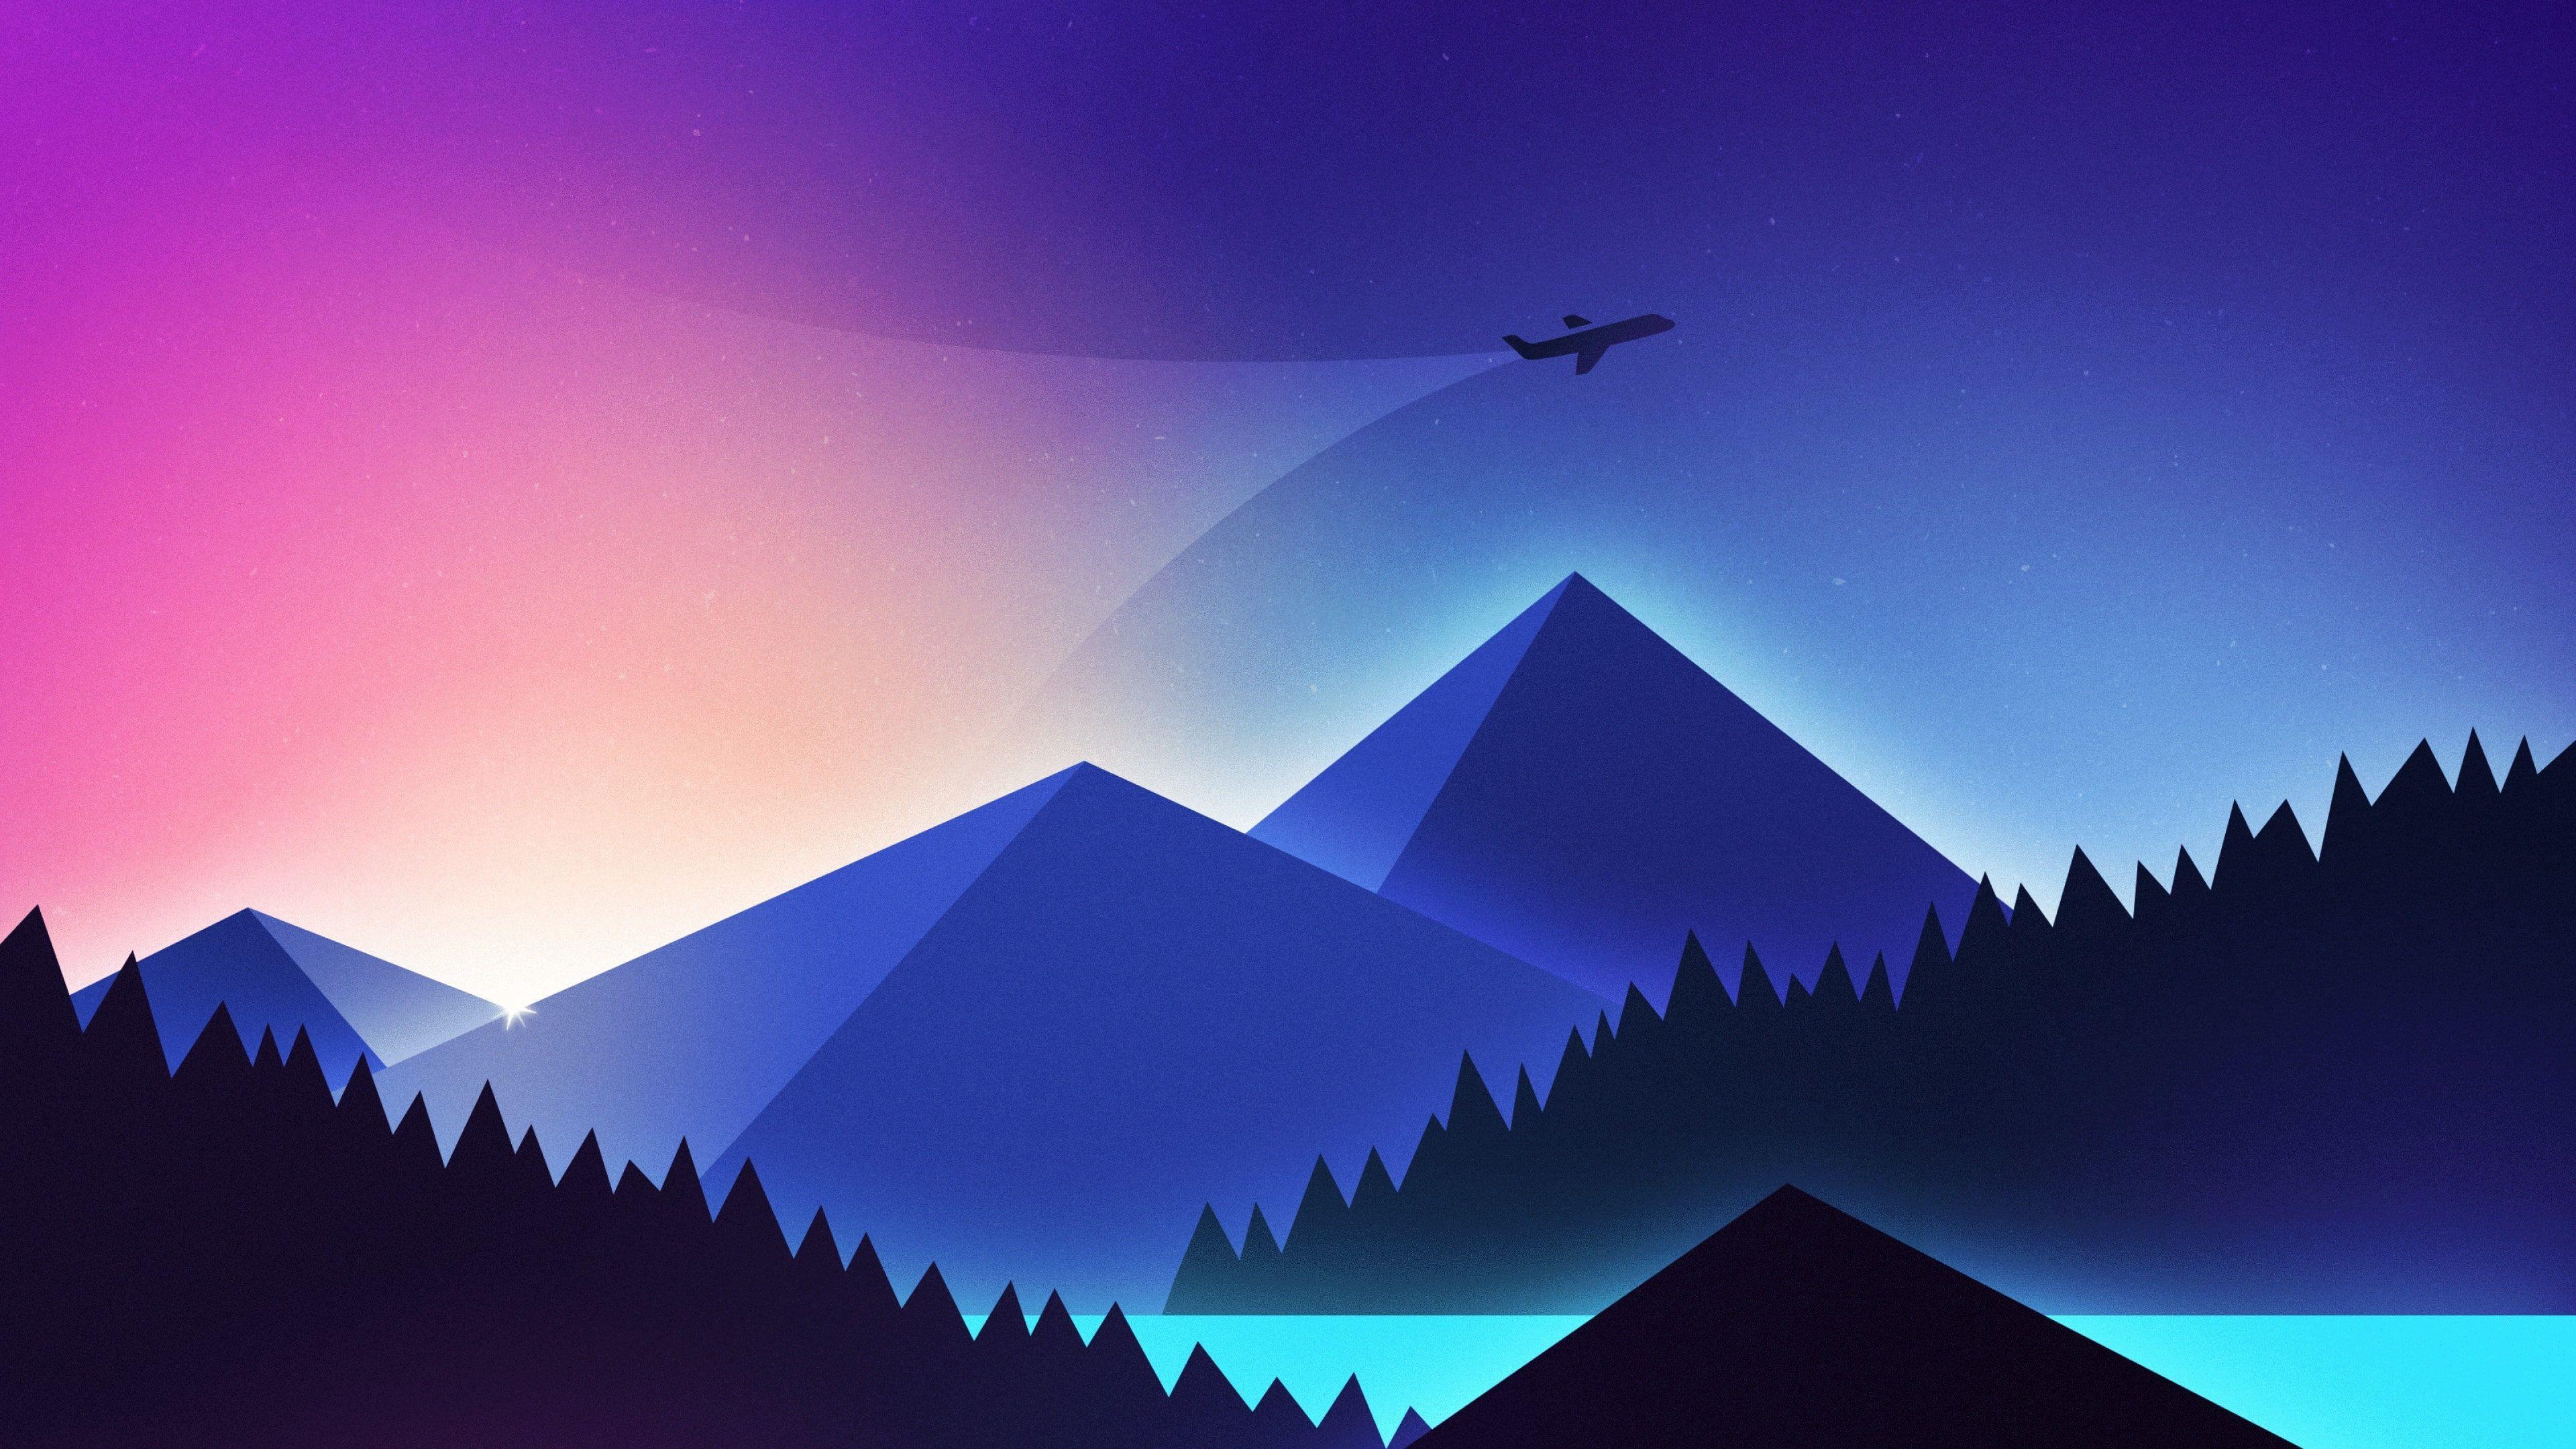 Minimalism Minimal Art Minimalist Airplane Minimal Pyramid Mountain Flying Digital Art Mountain Min Minimalist Wallpaper Colorful Landscape Art Wallpaper